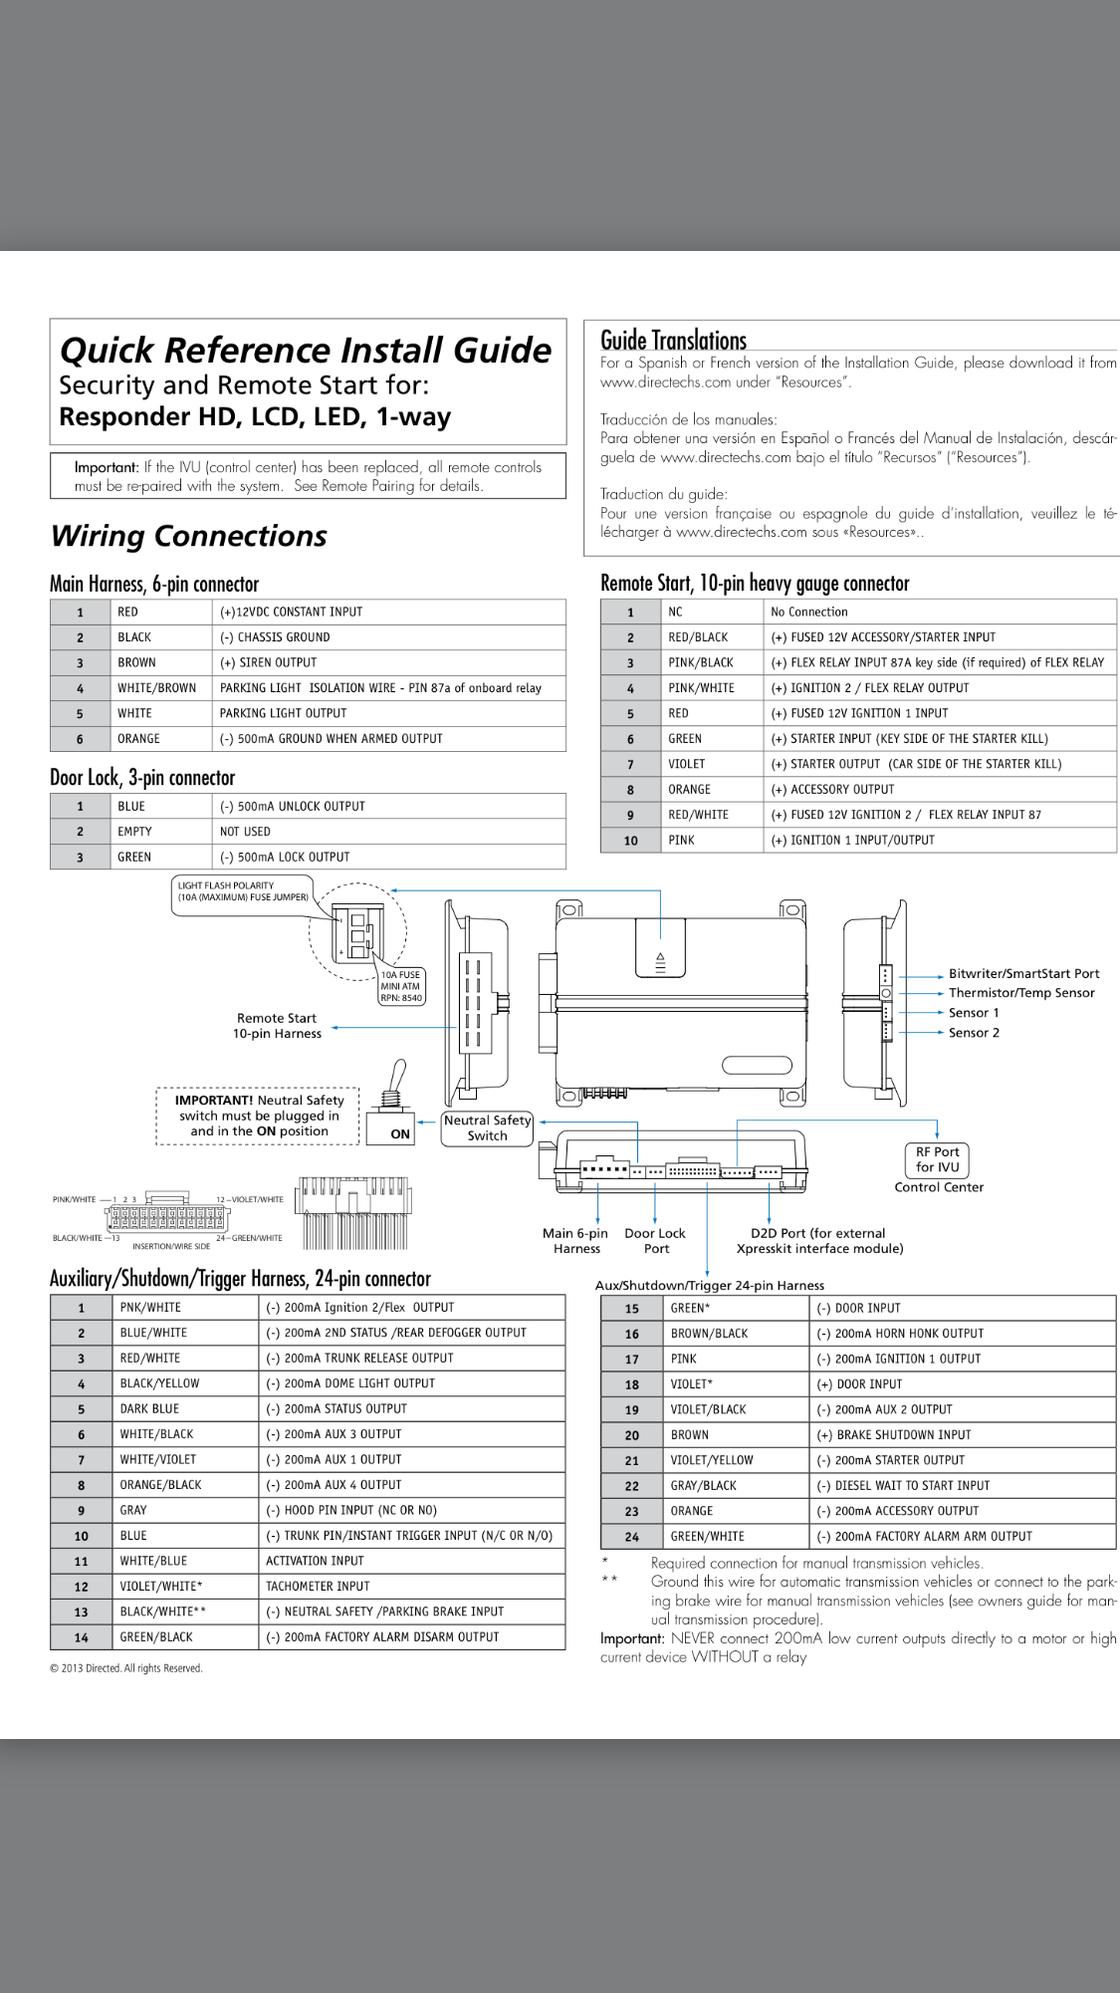 image_c2b3b748ebfbc193bd85753eb3e5f17a1af3e5ff Viper Alarm System Wiring Diagram on viper alarm system parts, viper alarm system installation, viper remote start diagram, viper car alarm system diagram, viper battery backup wiring, viper remote starter wiring diagram, viper keyless entry wiring diagram, viper 5704 wiring diagram, viper alarm system manual, viper alarm wire diagram 650,